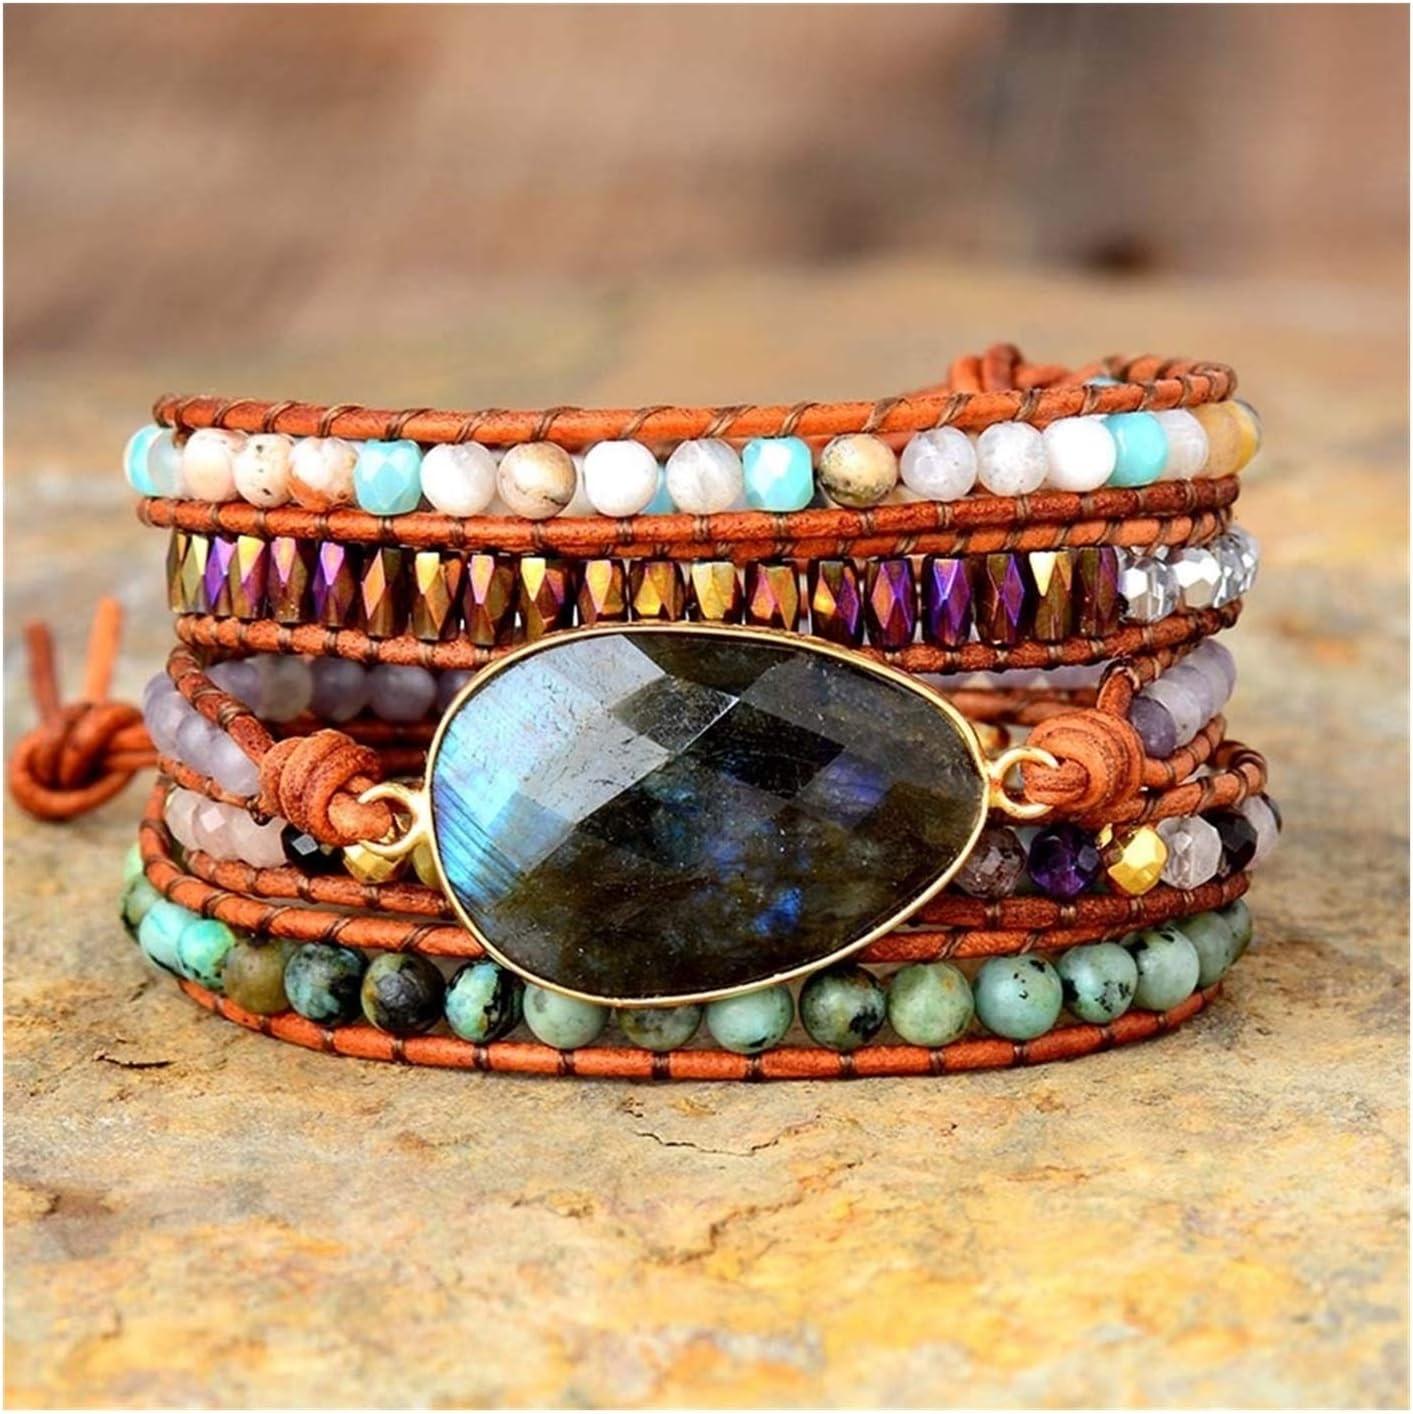 High material All stores are sold AOSUAI Women Boho Bracelets Labradorite Leather 5 Strands Strap